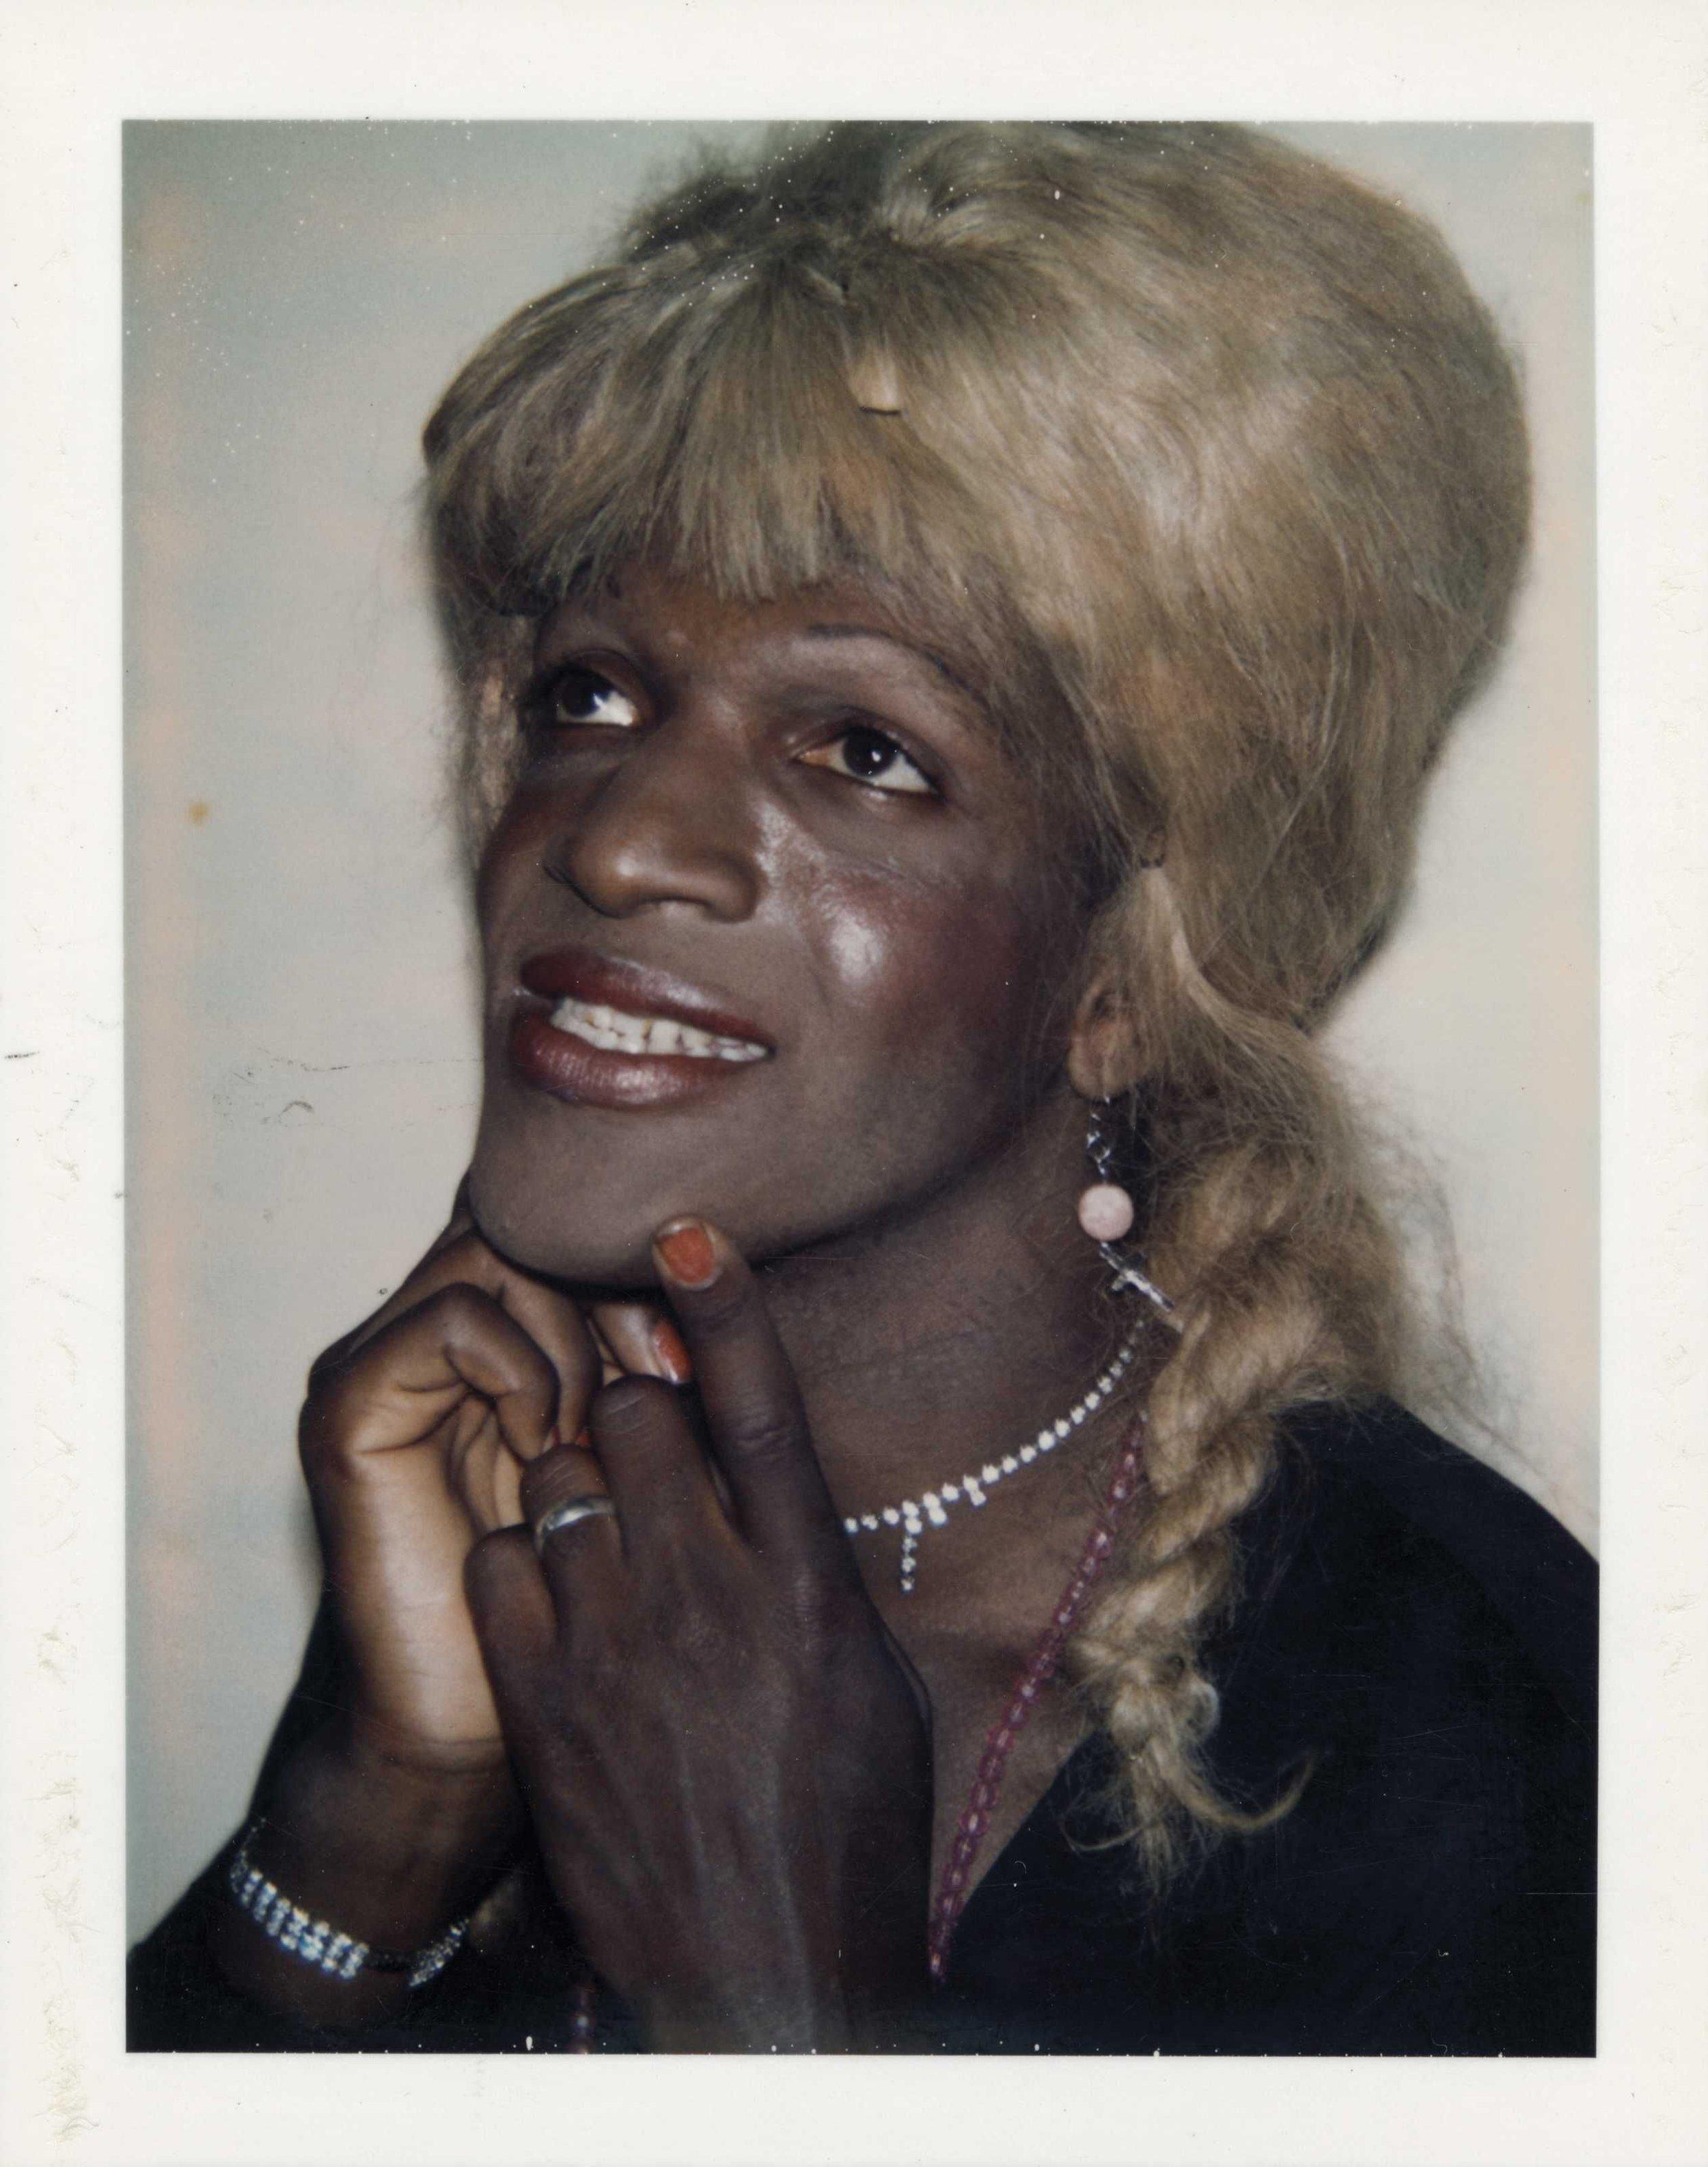 Chris Prescott of Finch and Partners Creative selects transgender pioneer and activist Marsha P. Johnson